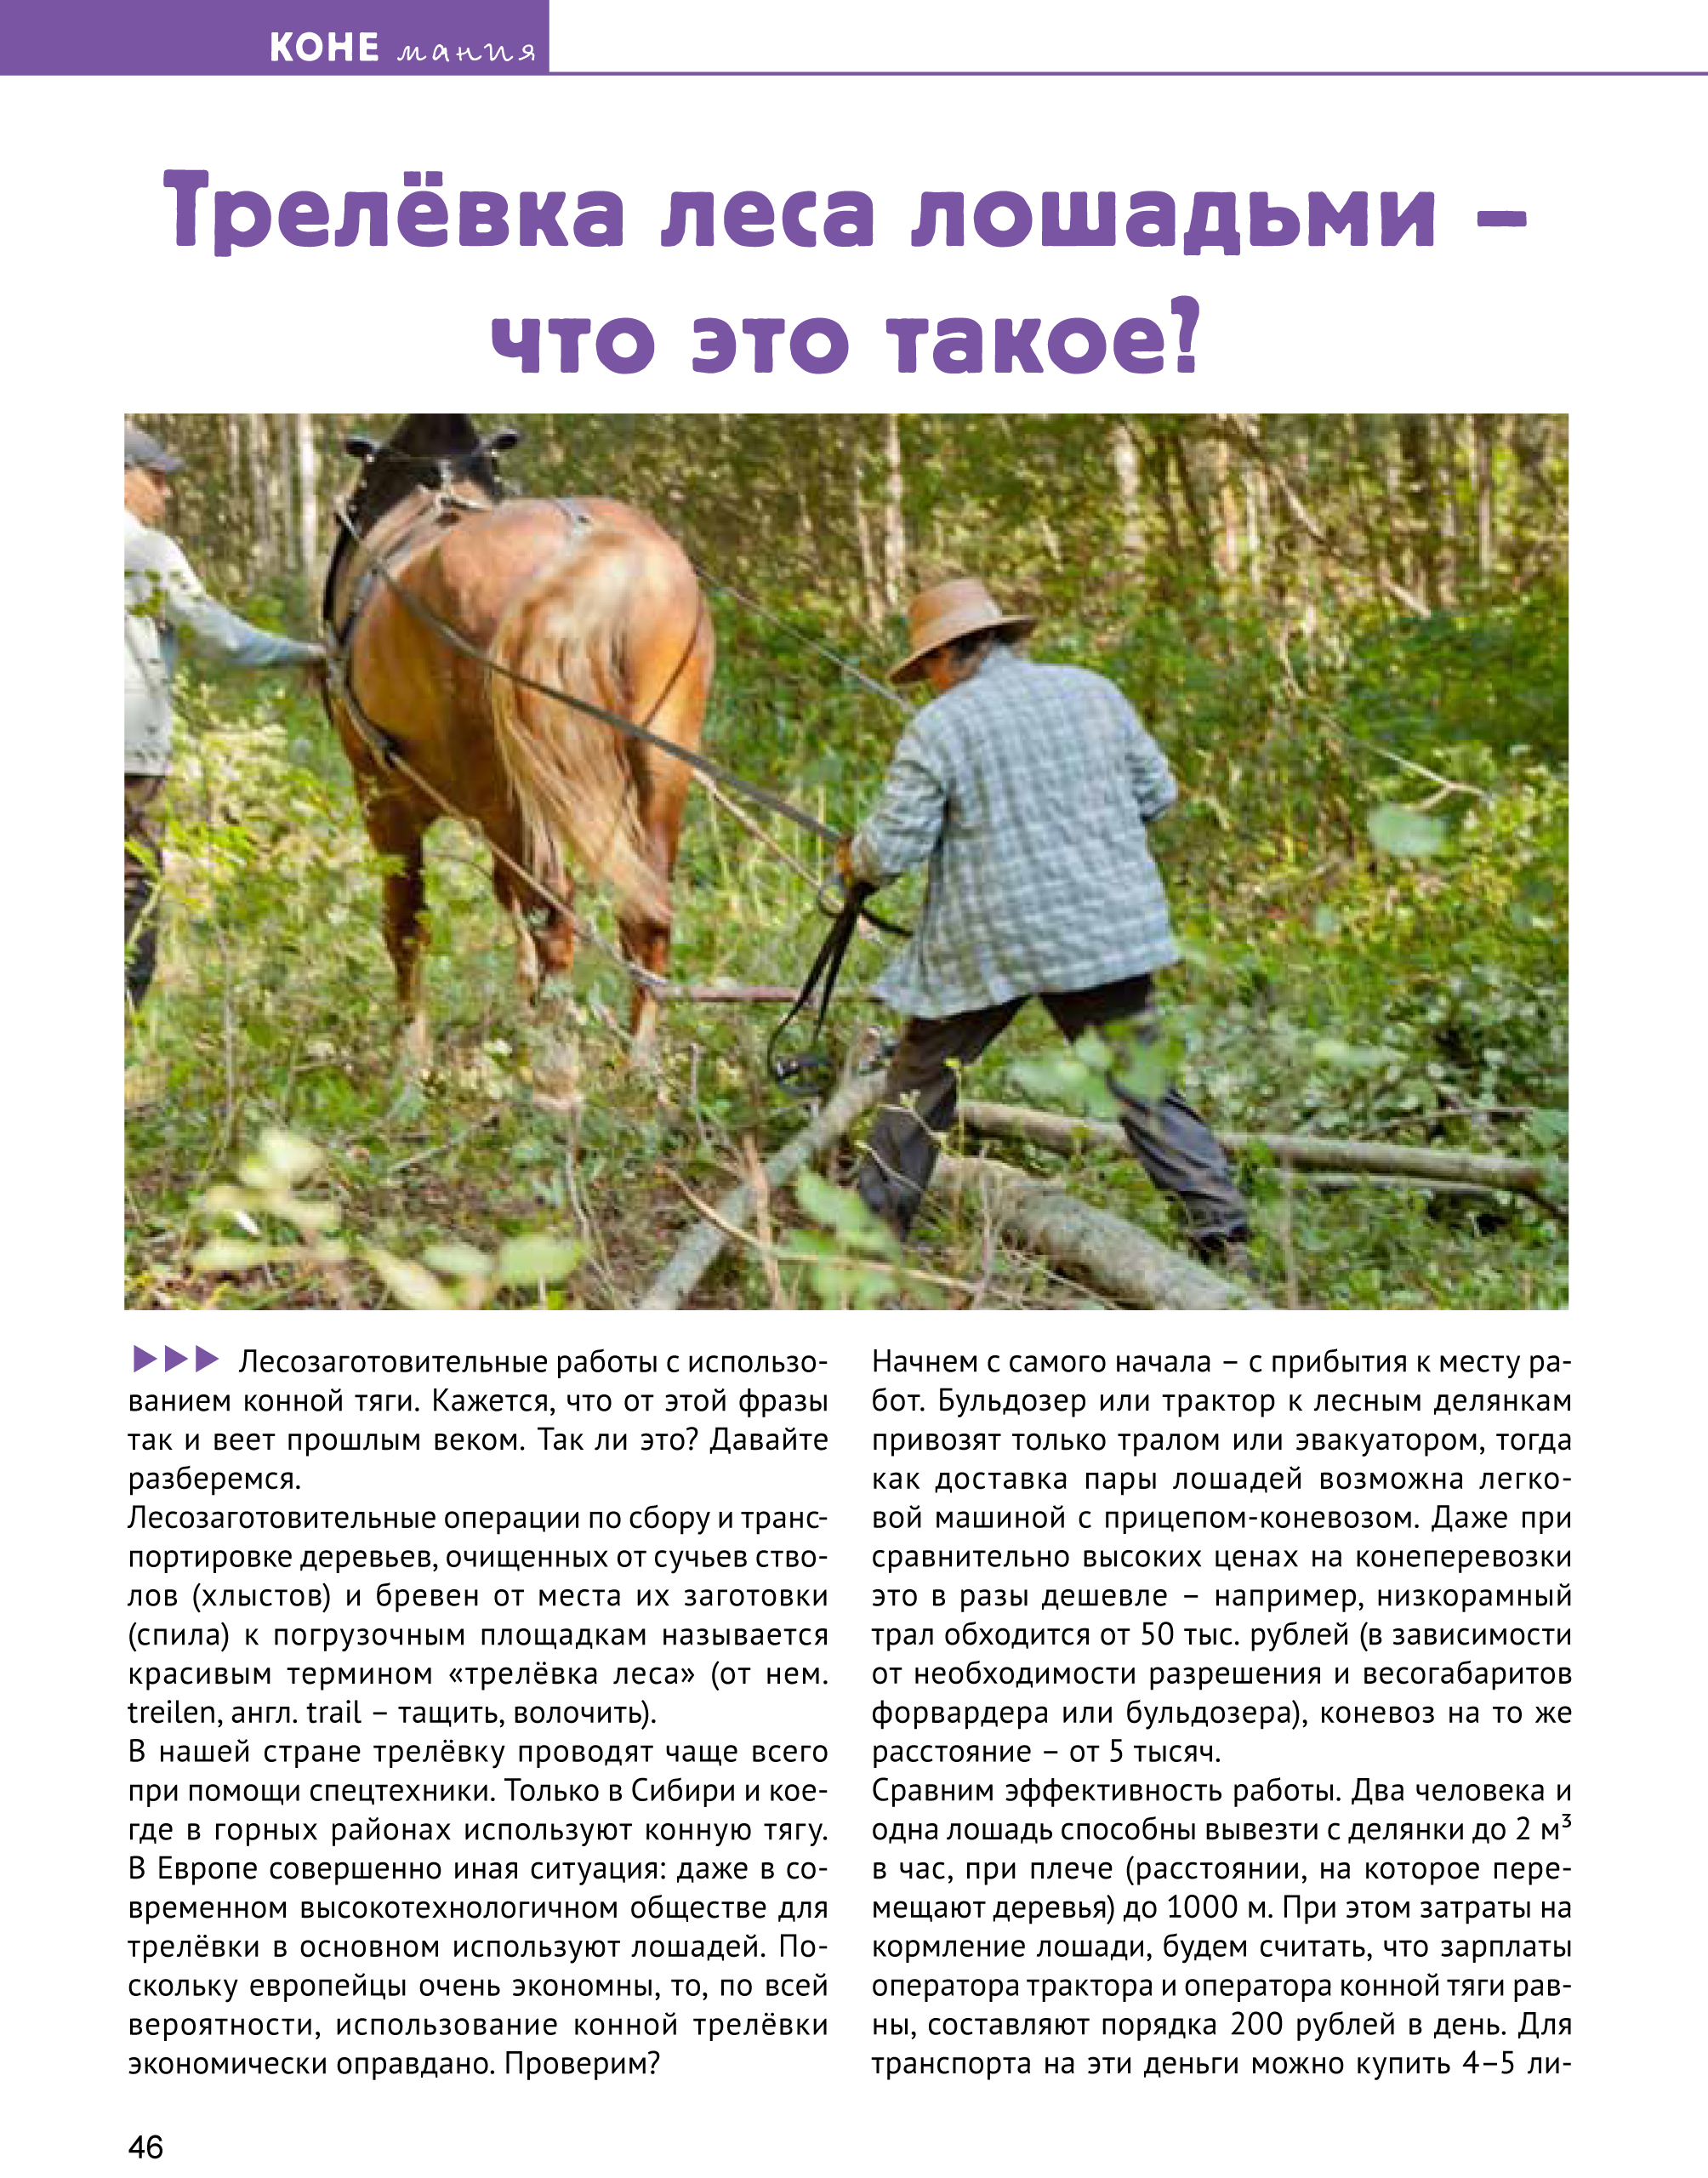 Book 5 2018 ДЛЯ САЙТА-46